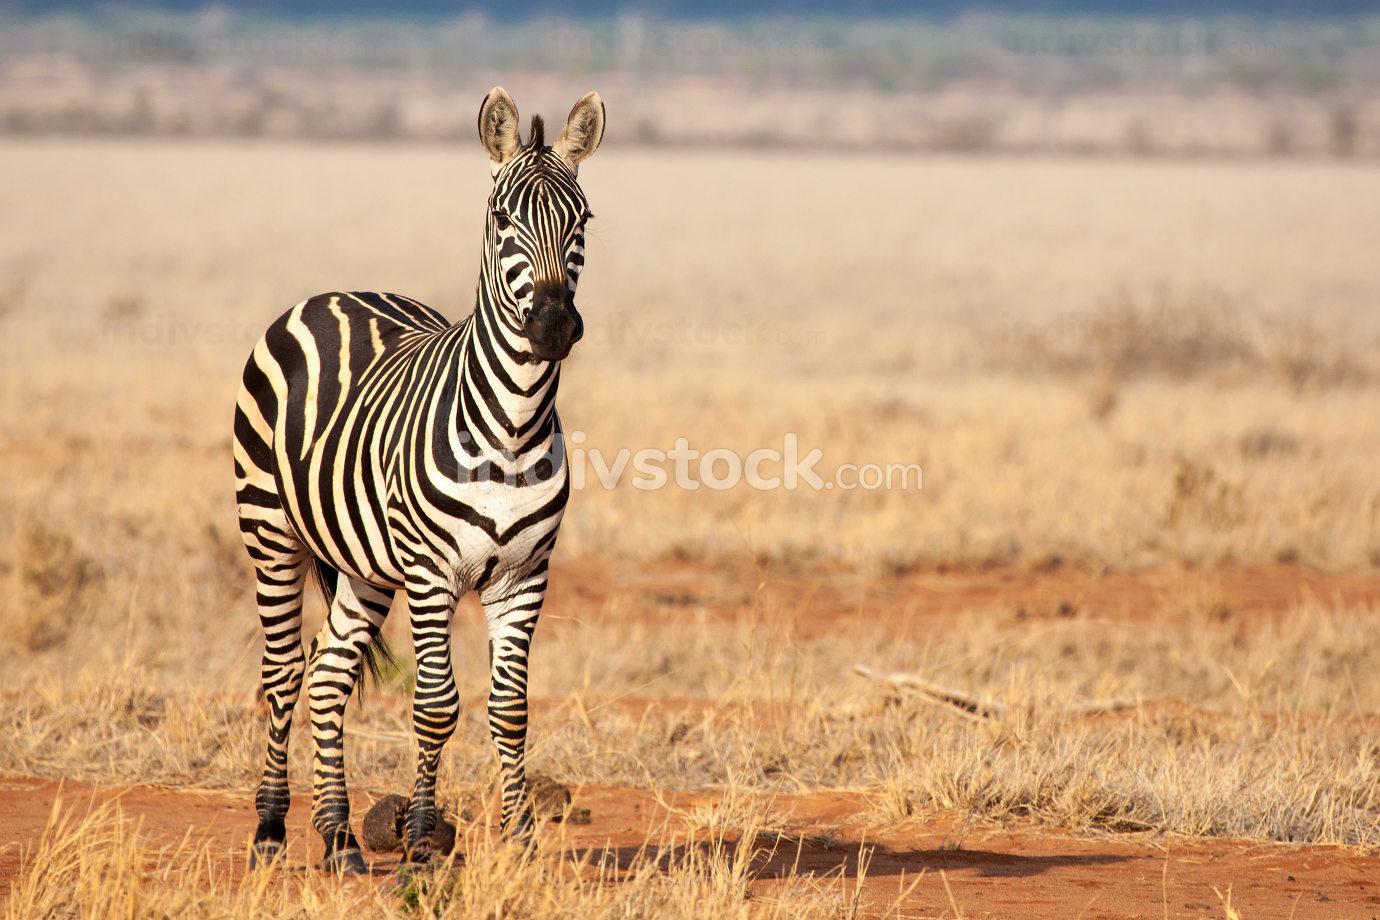 One zebra is standing in the savannah, on safari in Kenya, Tsavo